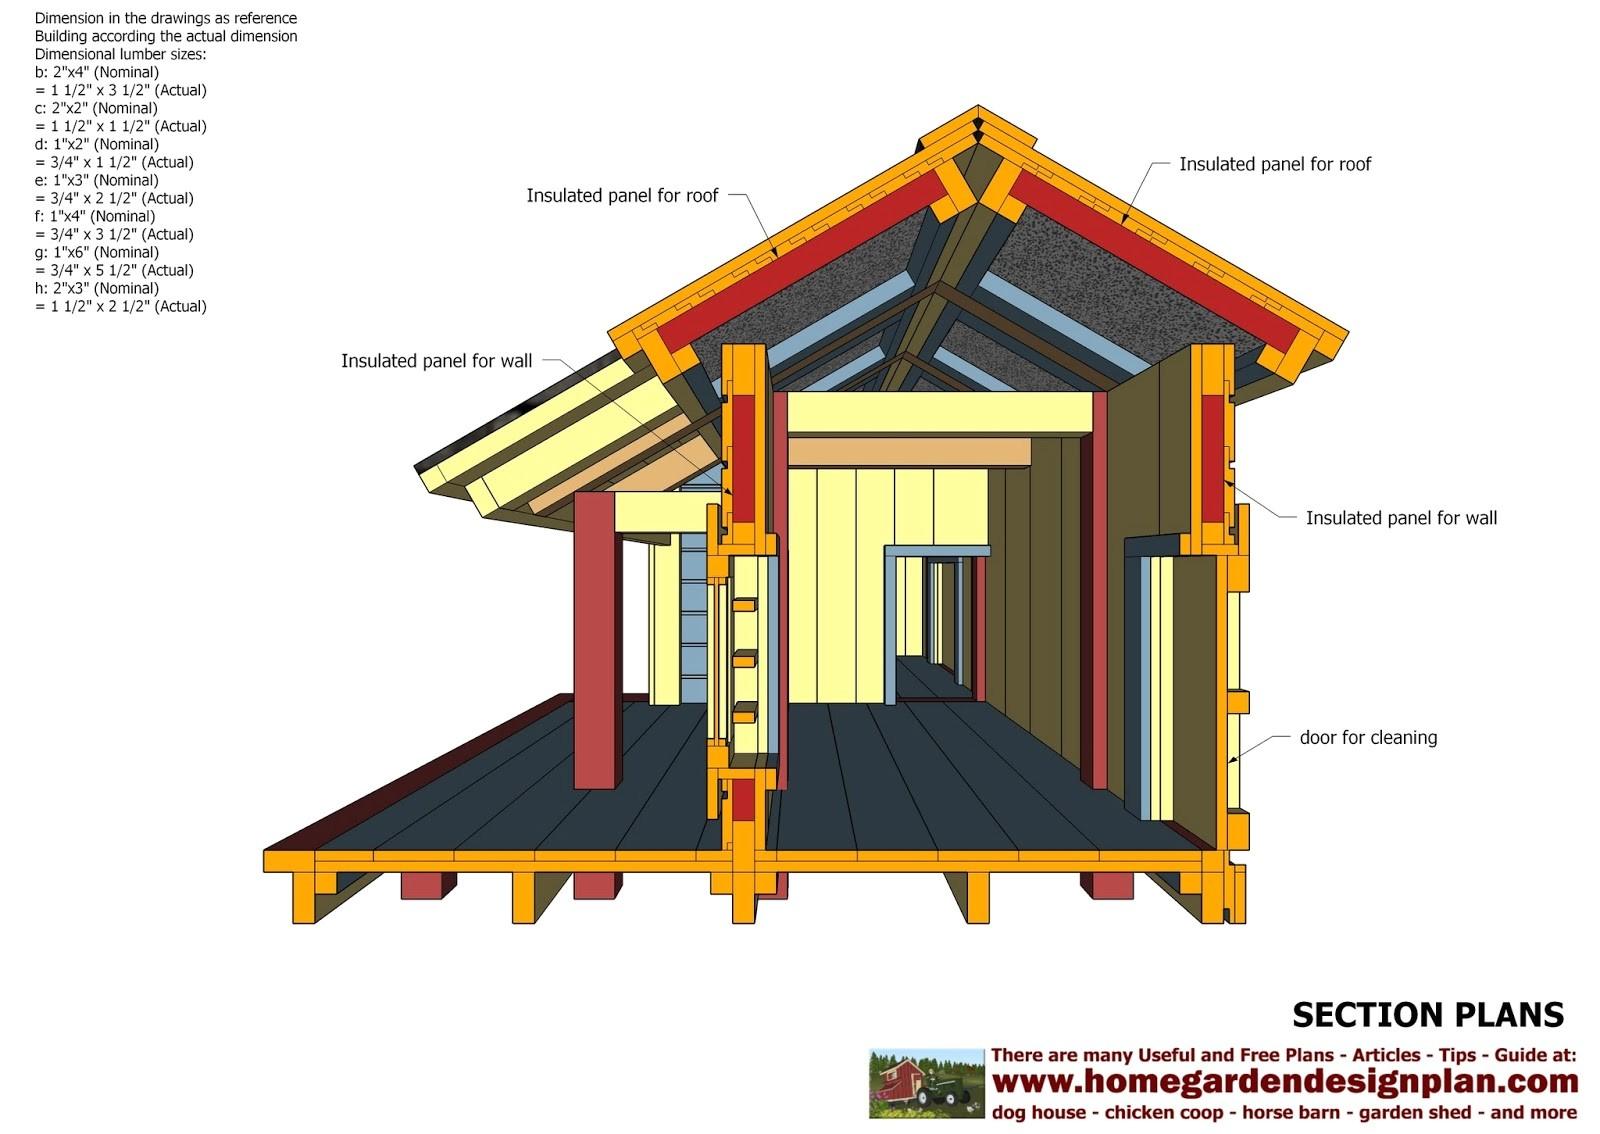 dh303 dog house plans dog house design